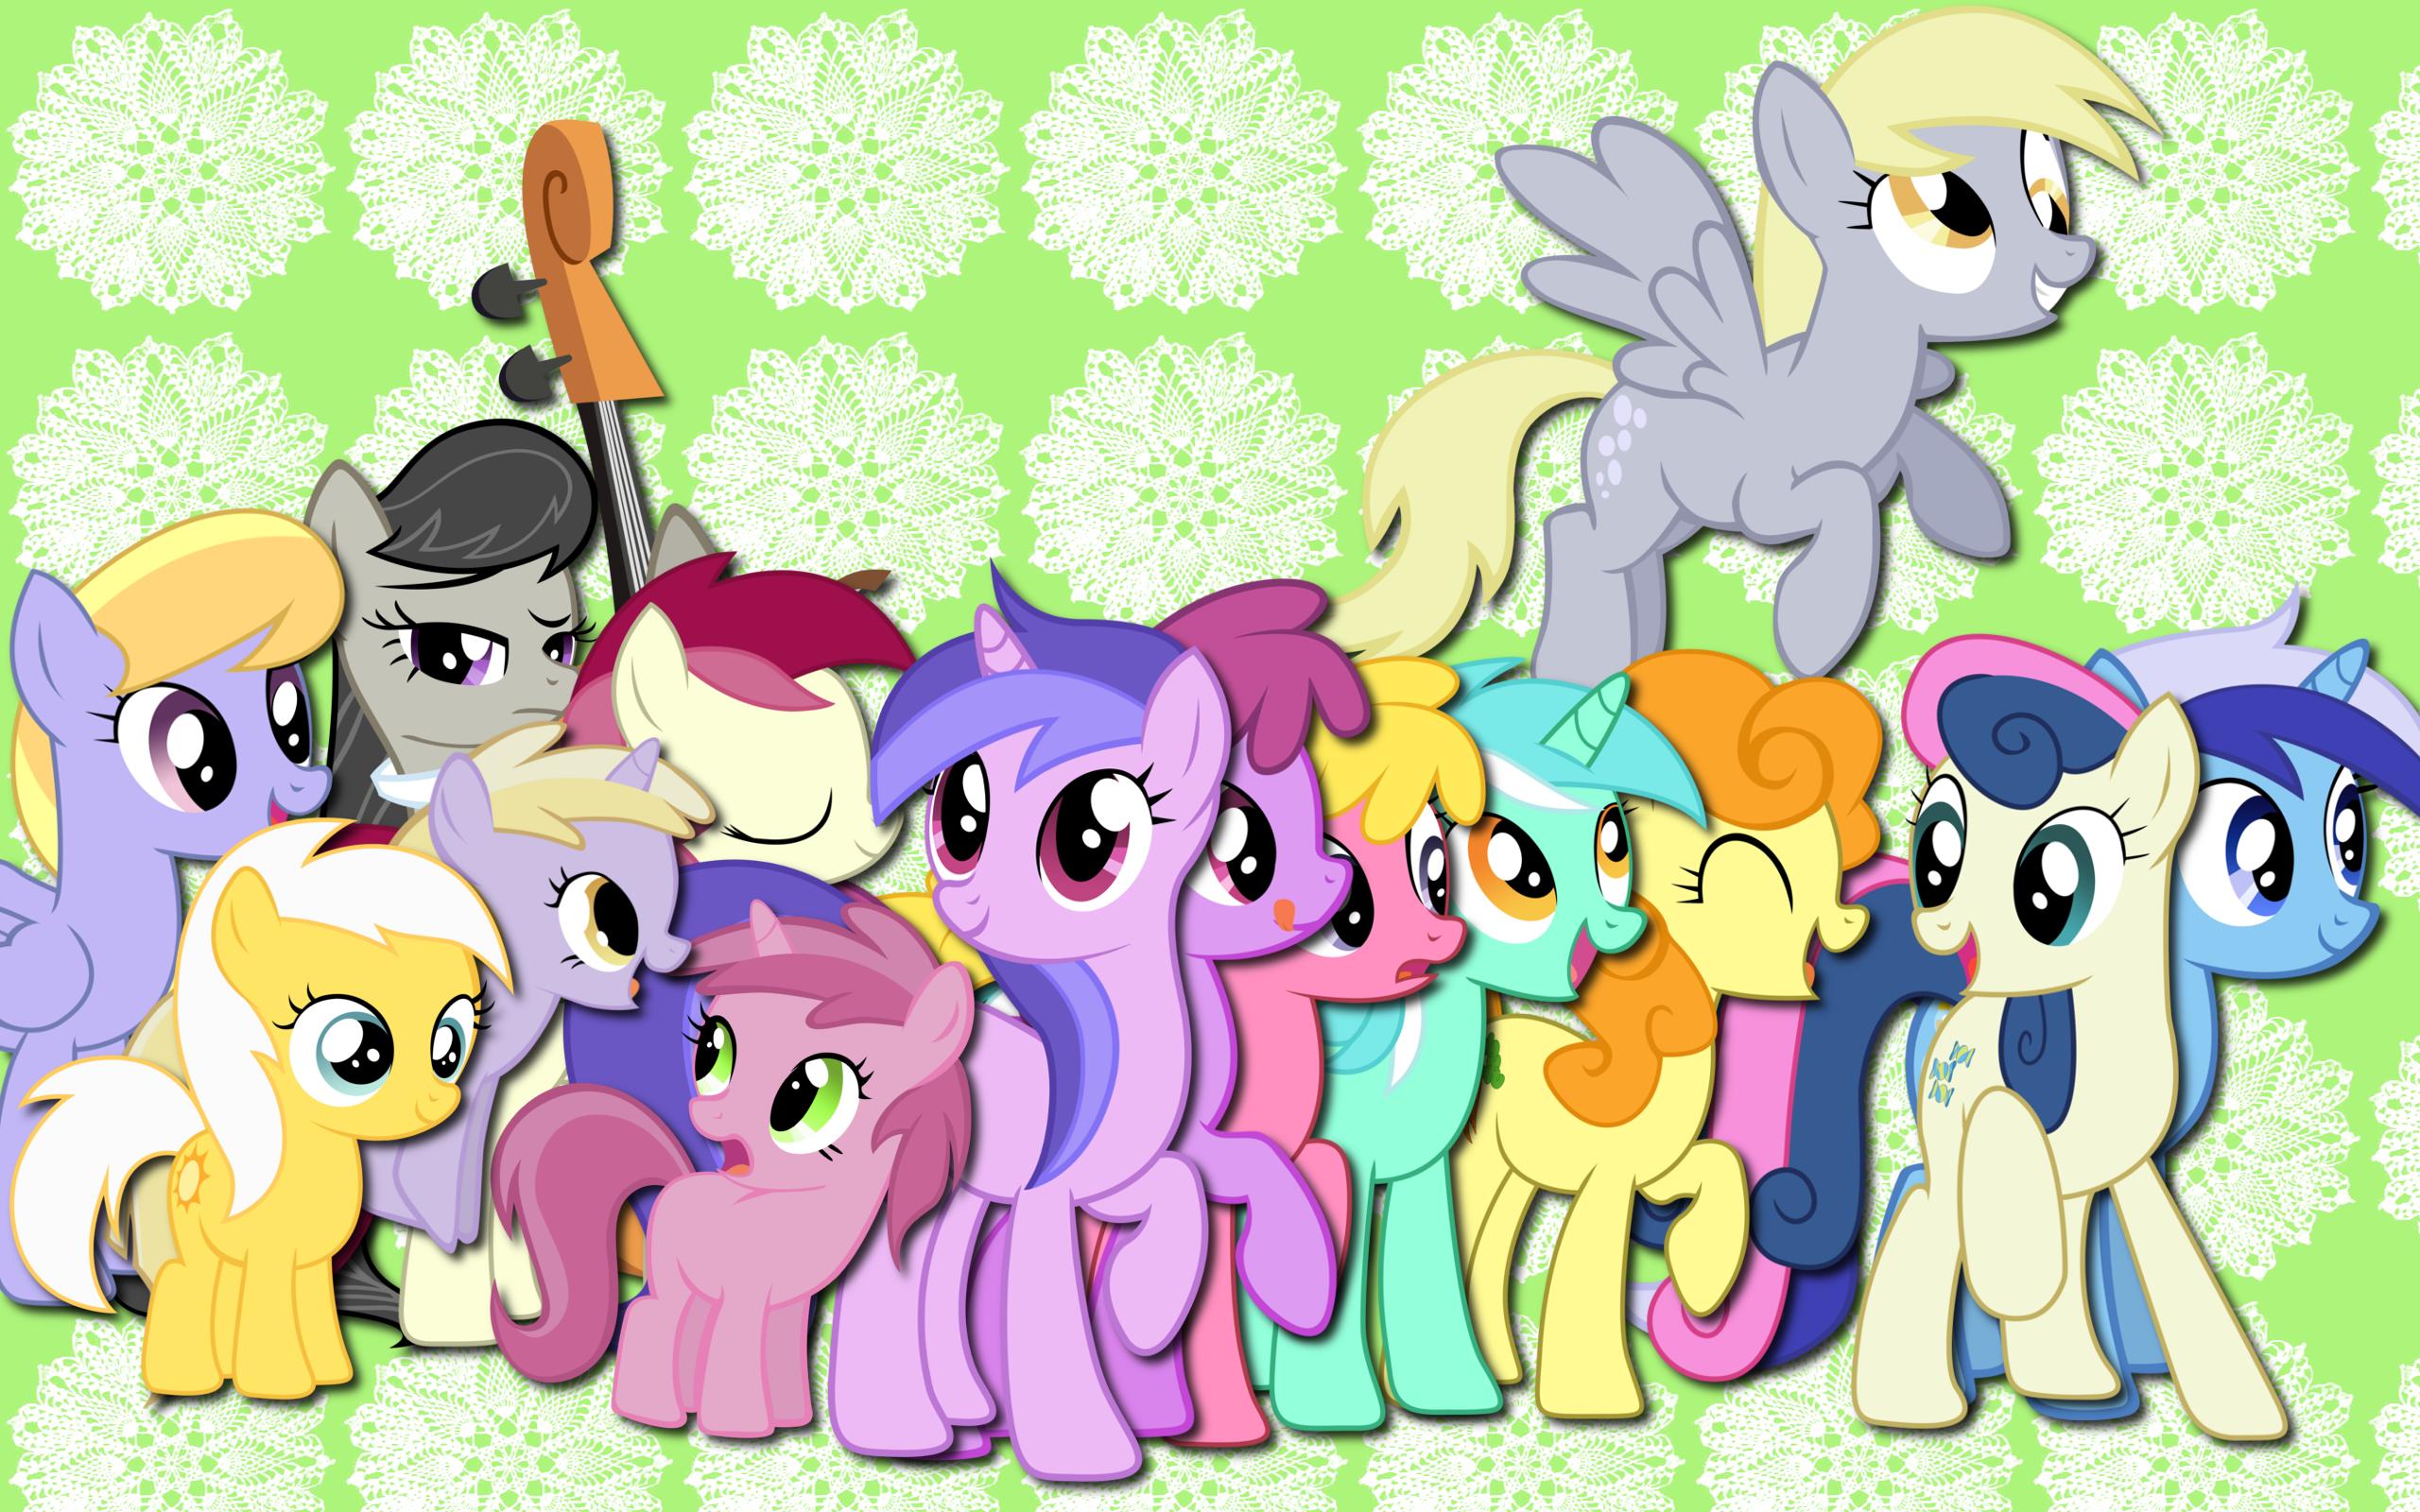 Background ponies WP by AliceHumanSacrifice0, Kooner-cz, MaximillianVeers, MoongazePonies, SierraEx and Takua770